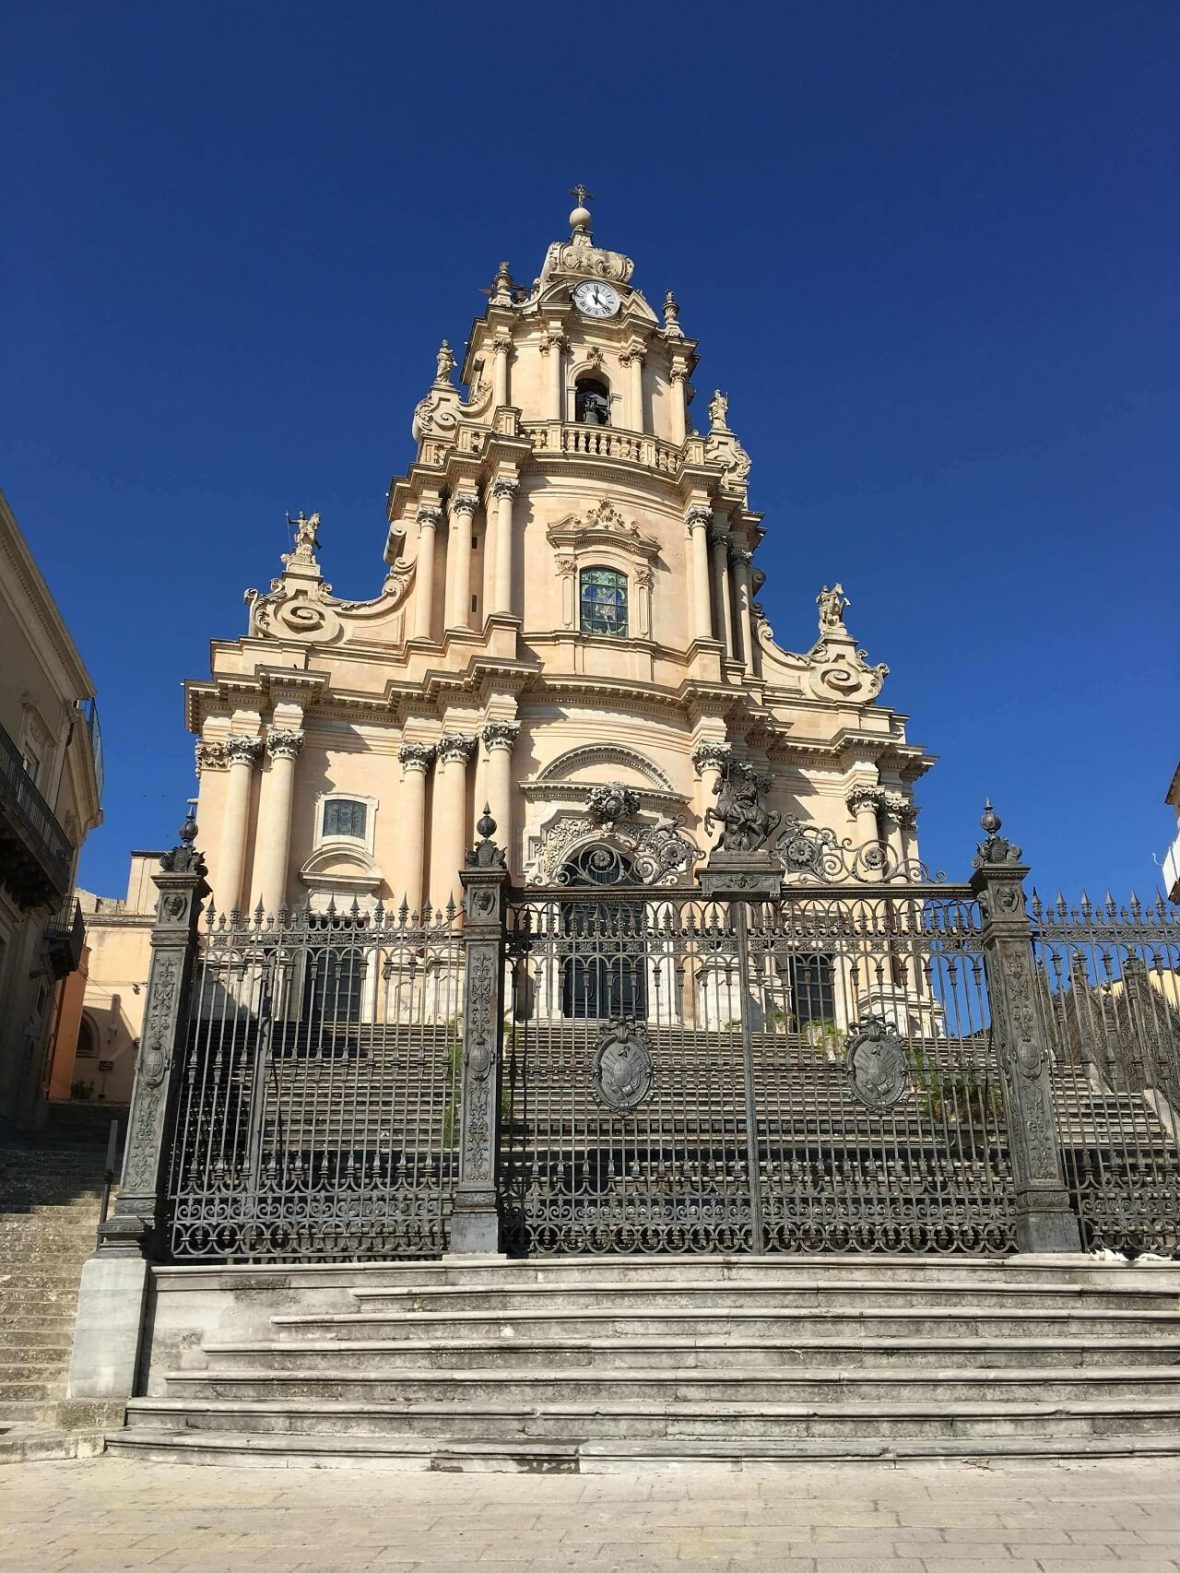 Ragusa's main square